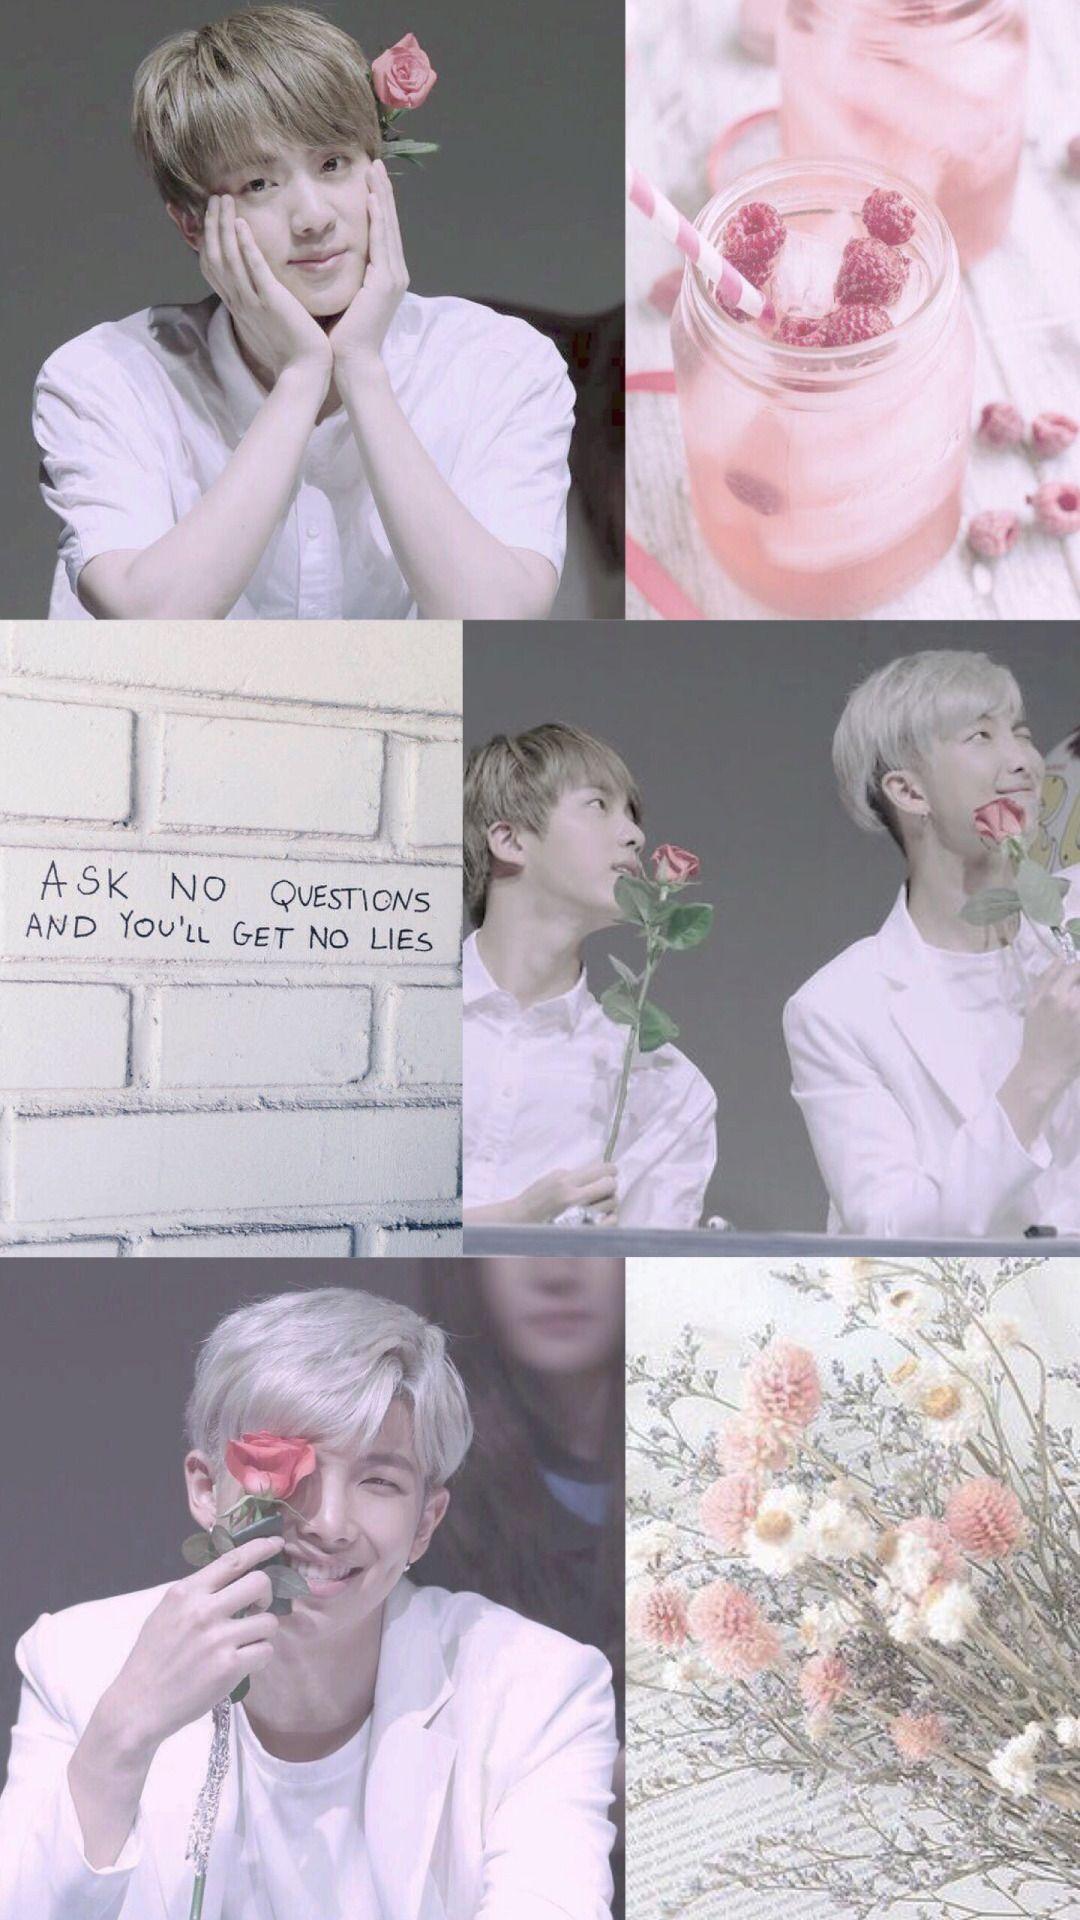 Jin iphone wallpaper tumblr - Aesthetic Bts Tumblr